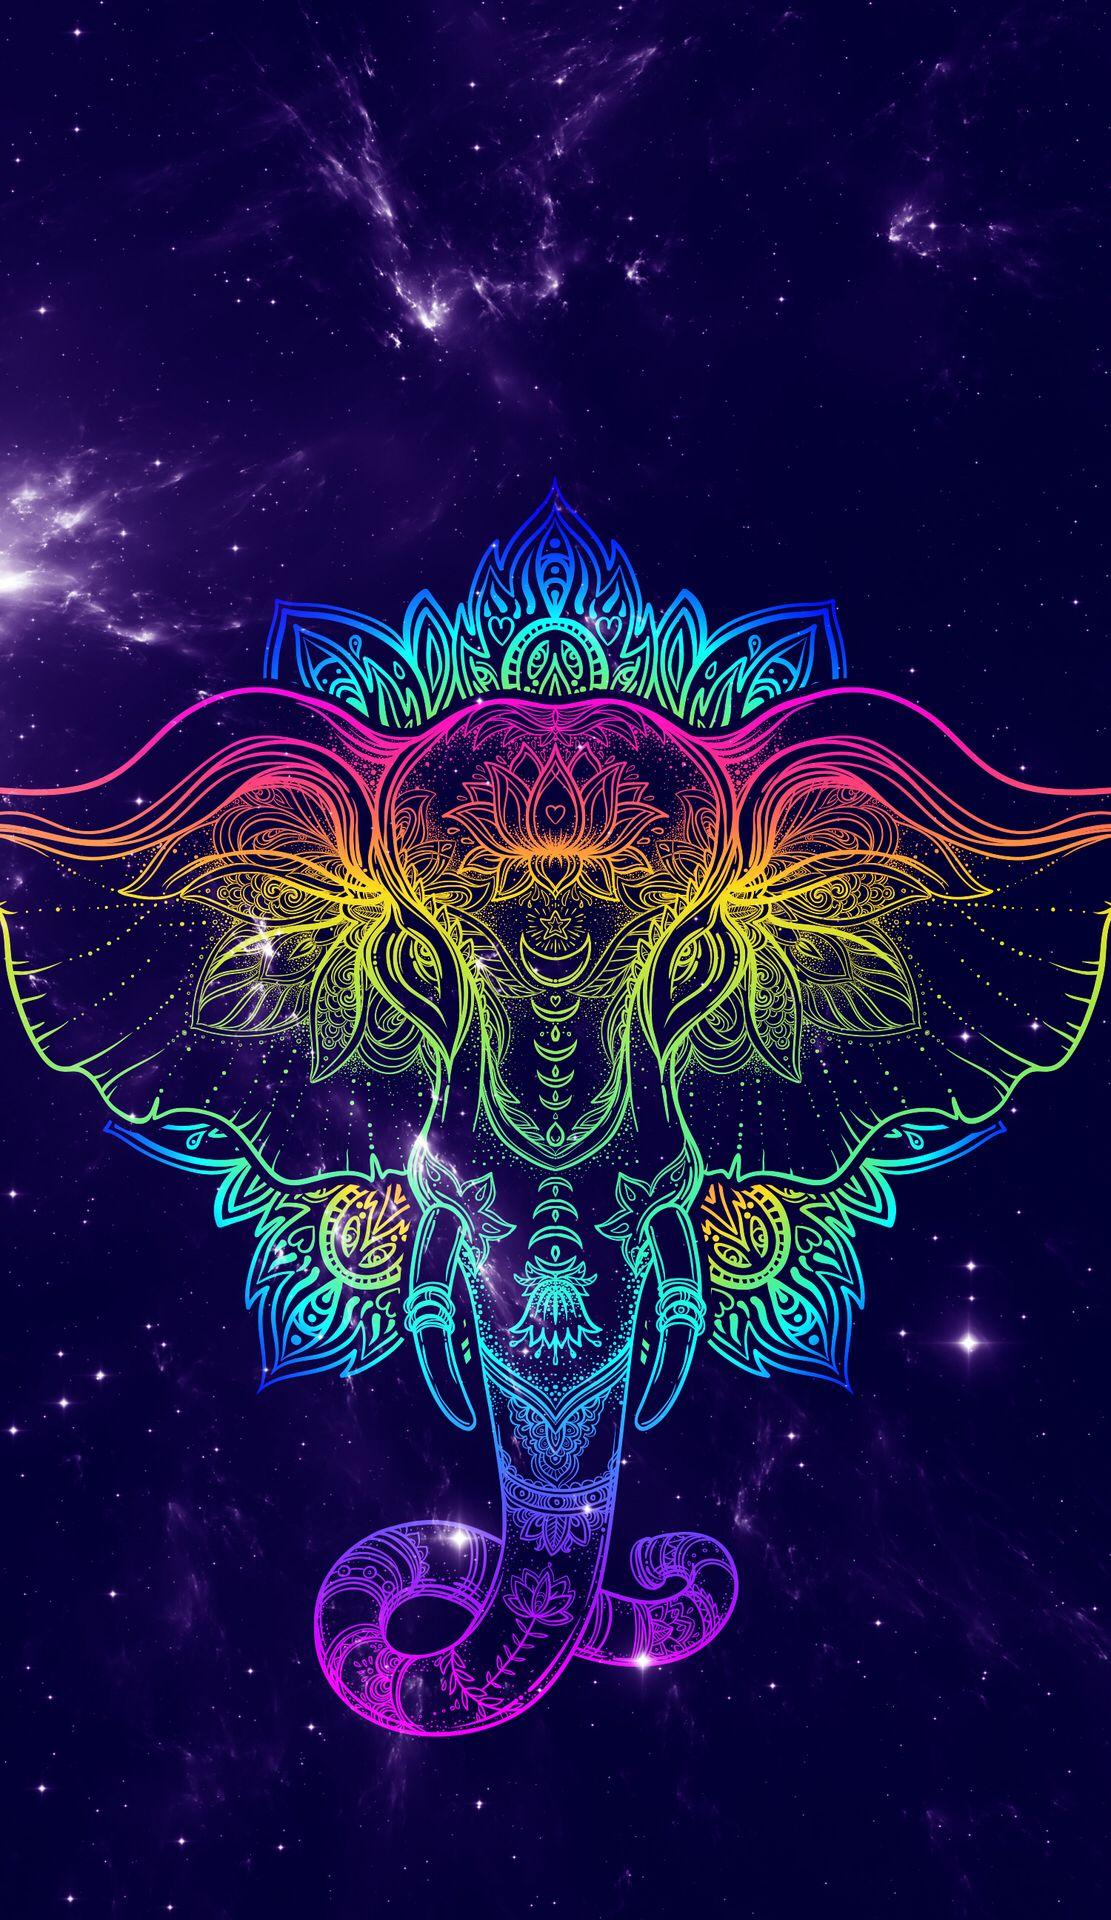 Elephant wallpaper, Neon